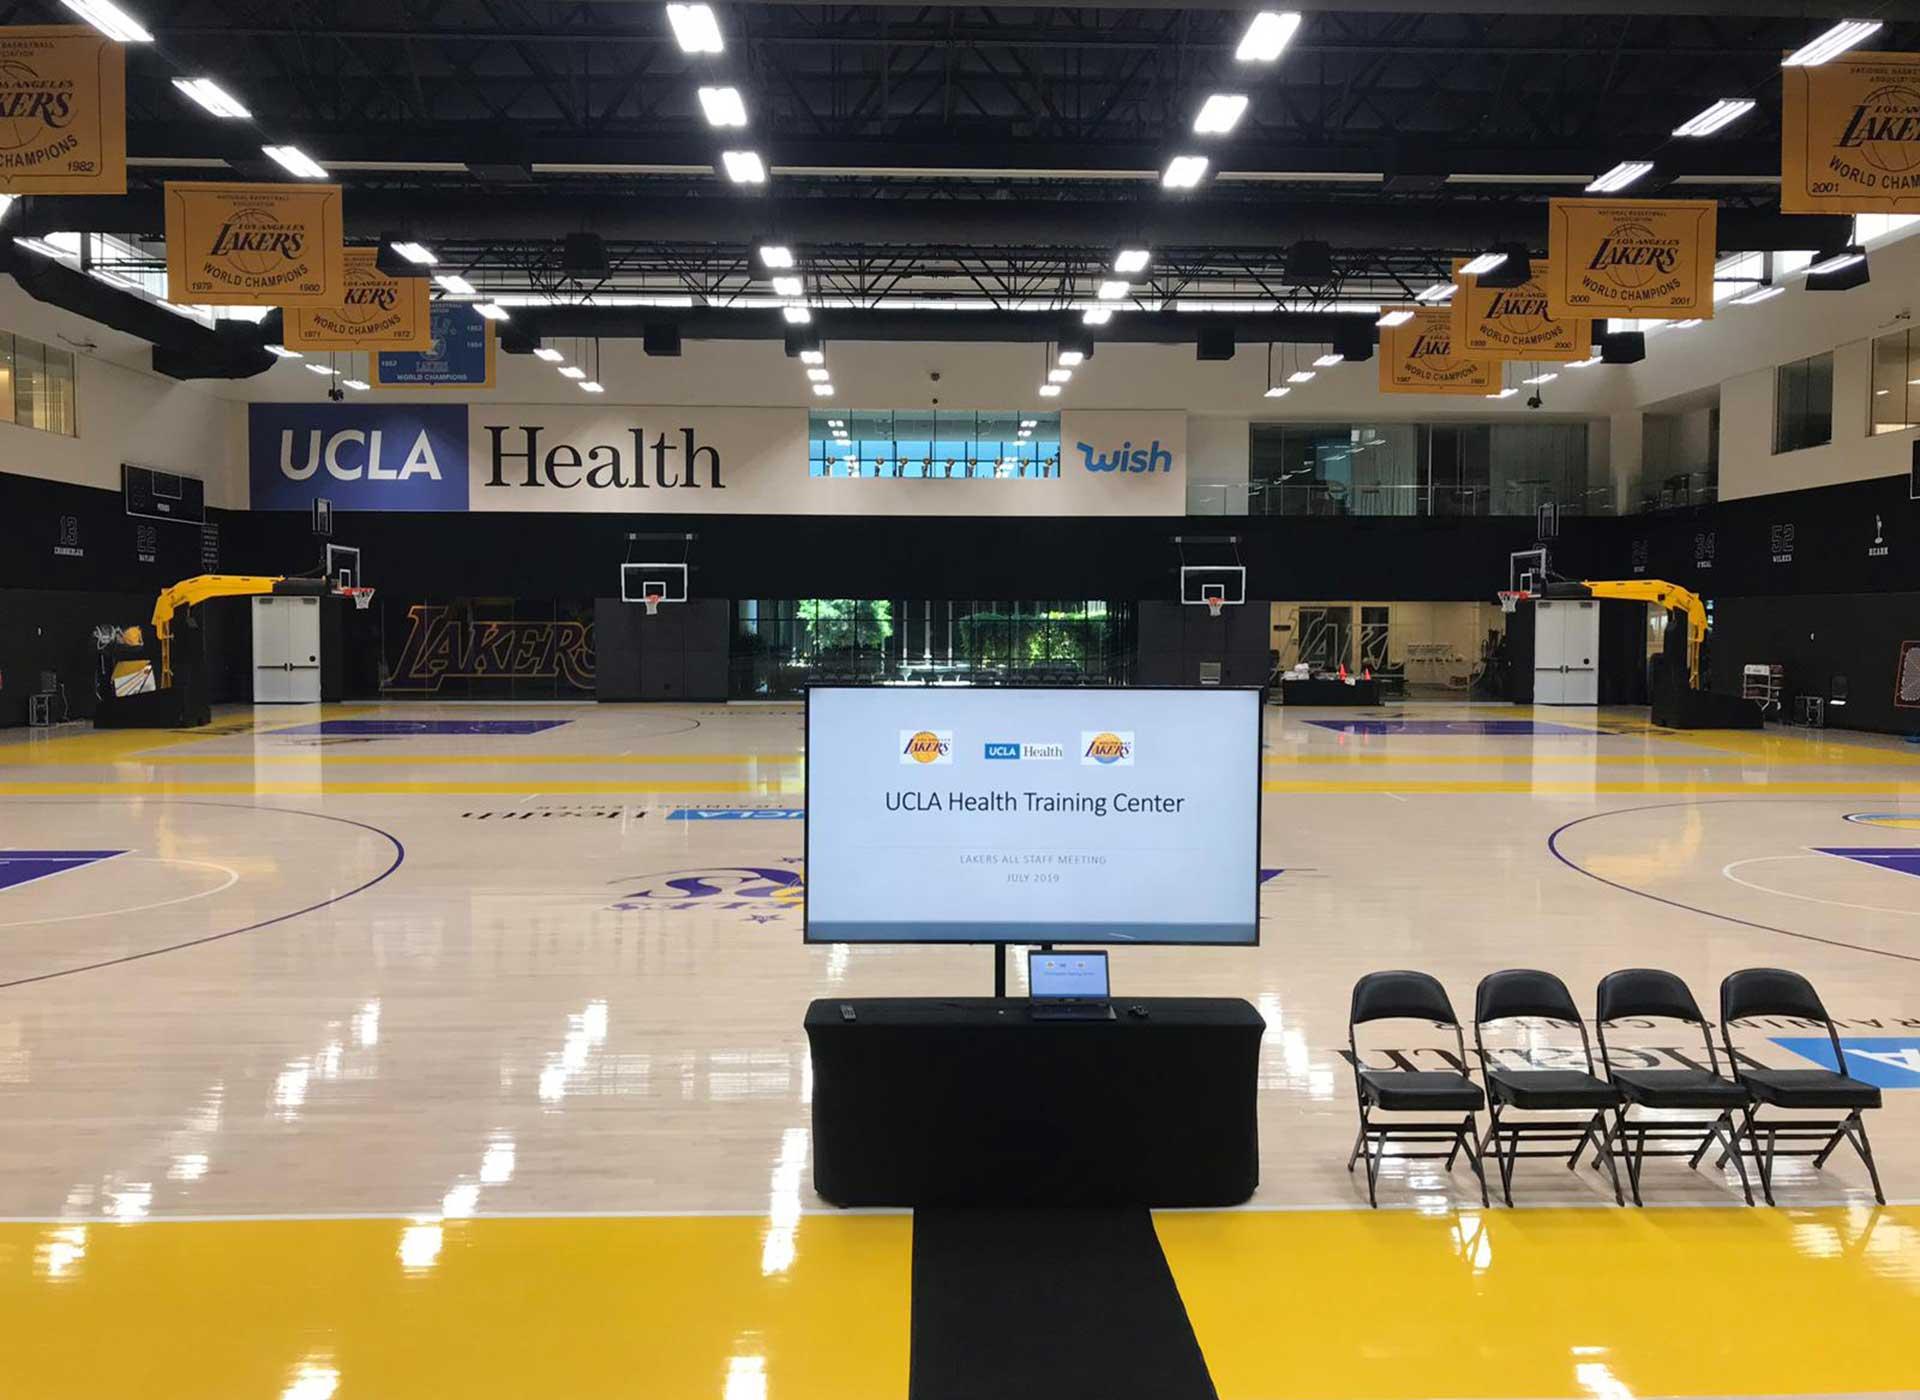 MiR Audio Video Setup Before Lakers Game